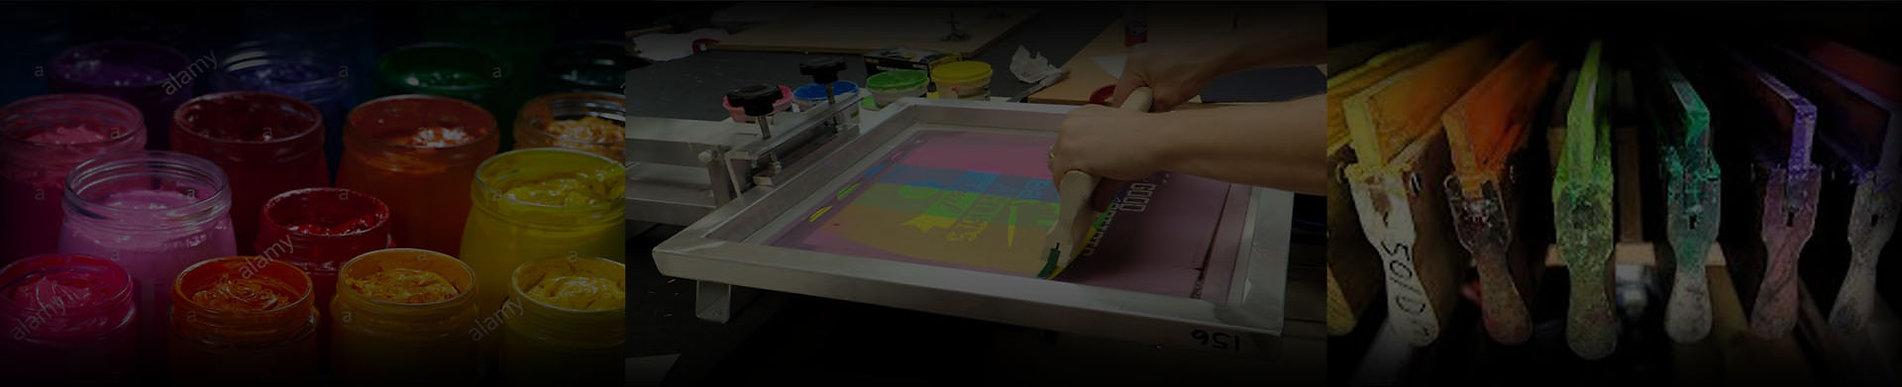 printingshadowbox.jpg